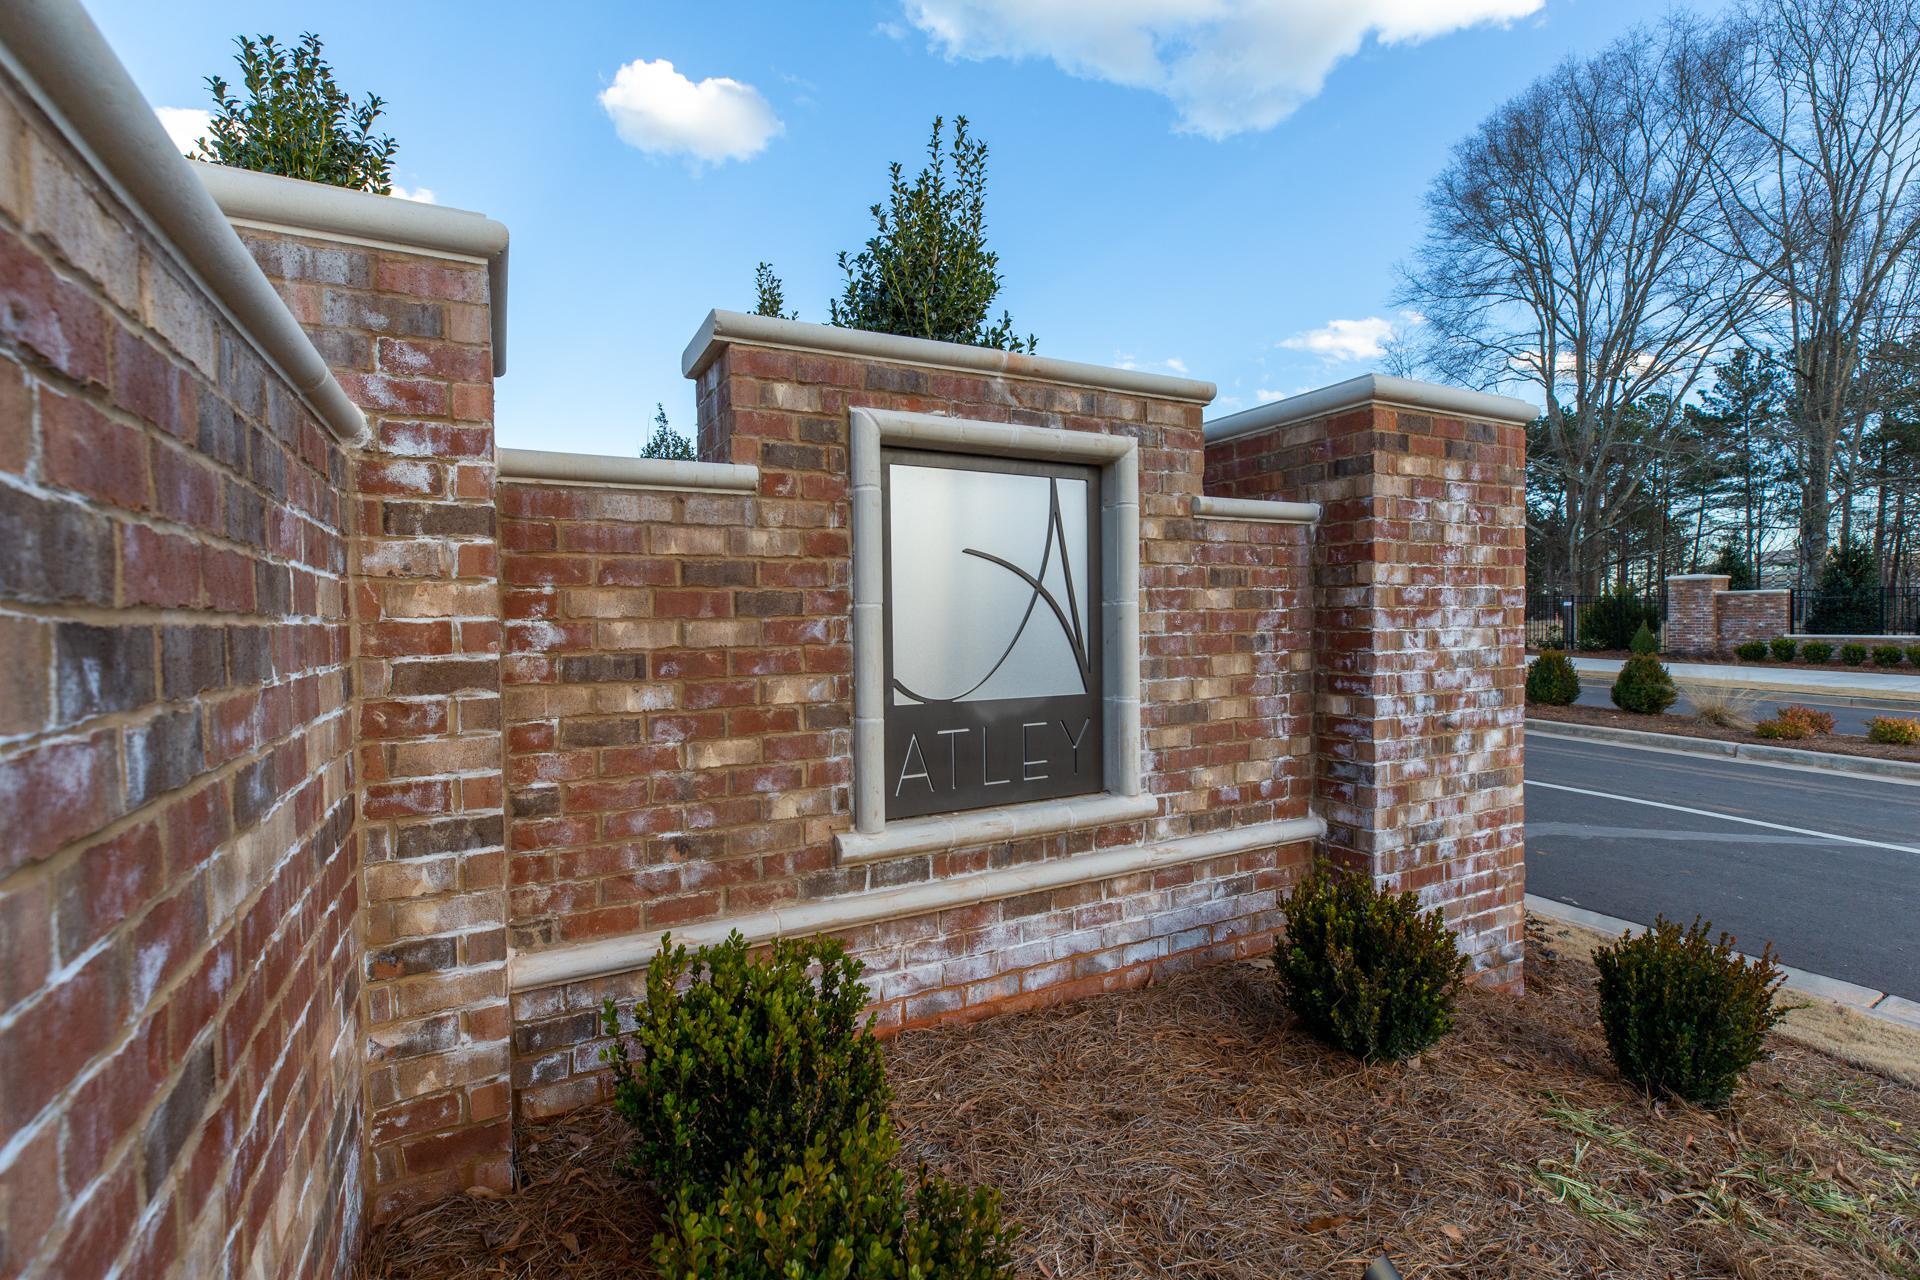 Atley New Homes in Alpharetta GA